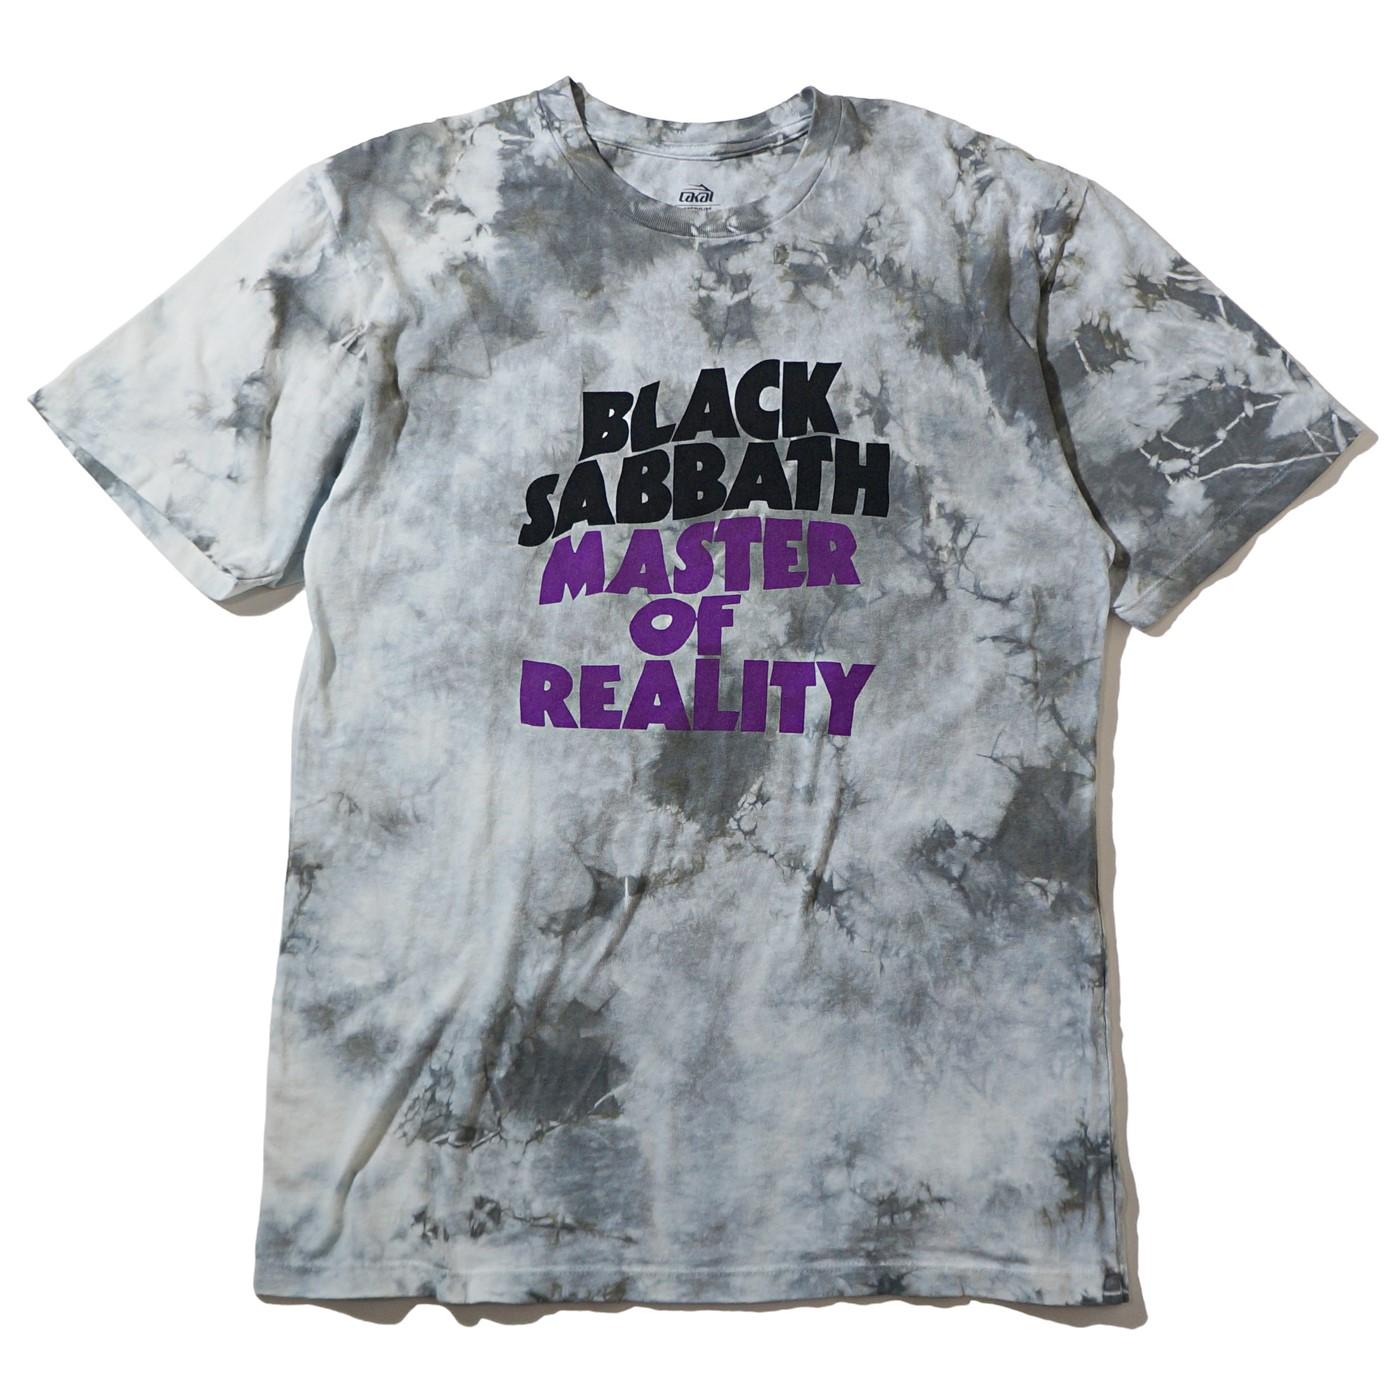 LAKAI x BLACK SABBATH Tシャツ Master Of Reality-White Tie Dye